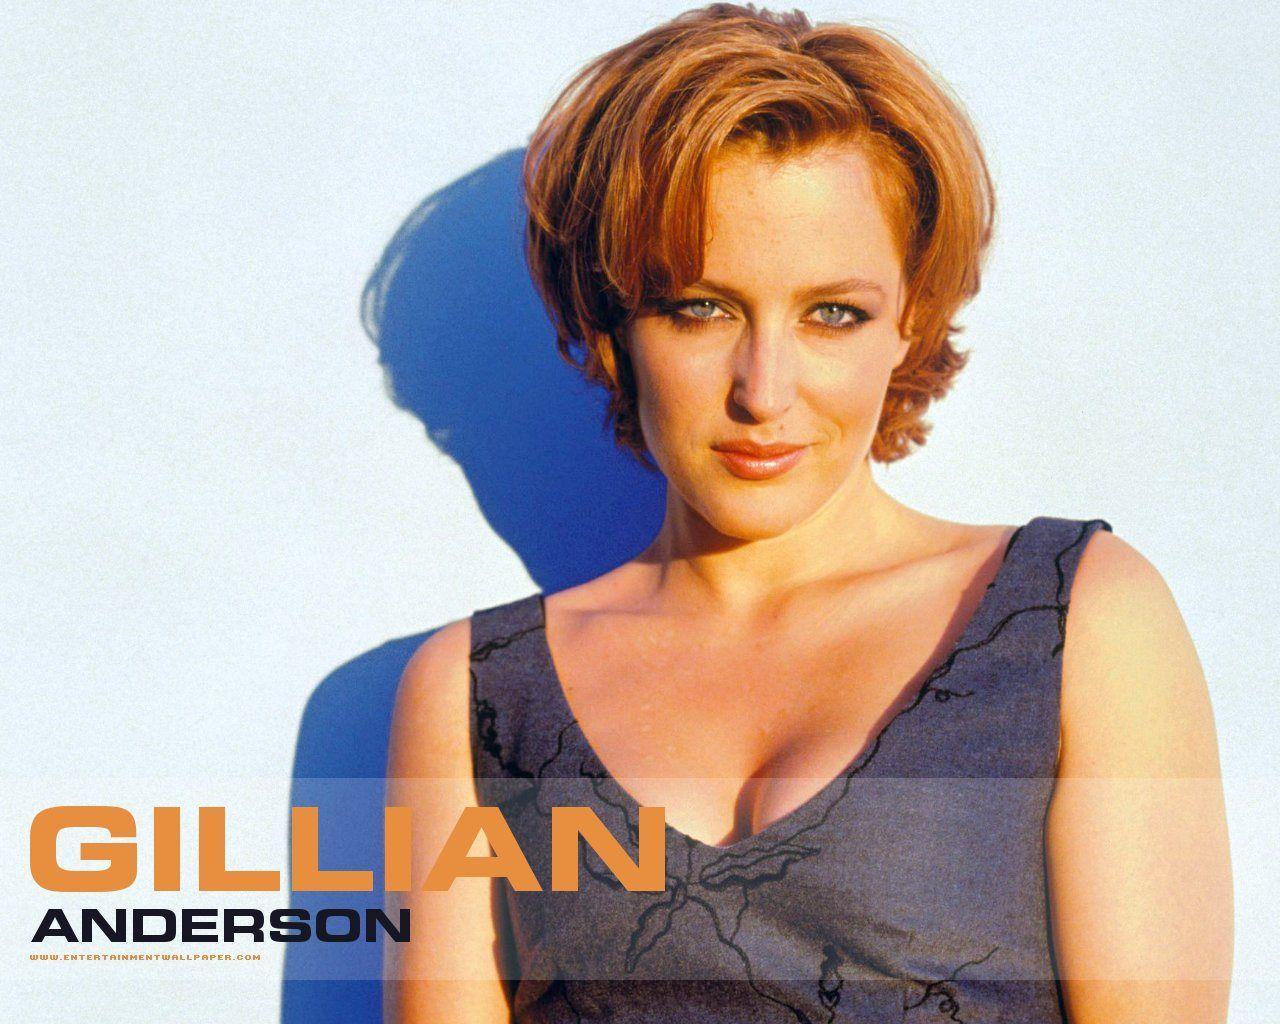 Gillian Anderson Eel g...